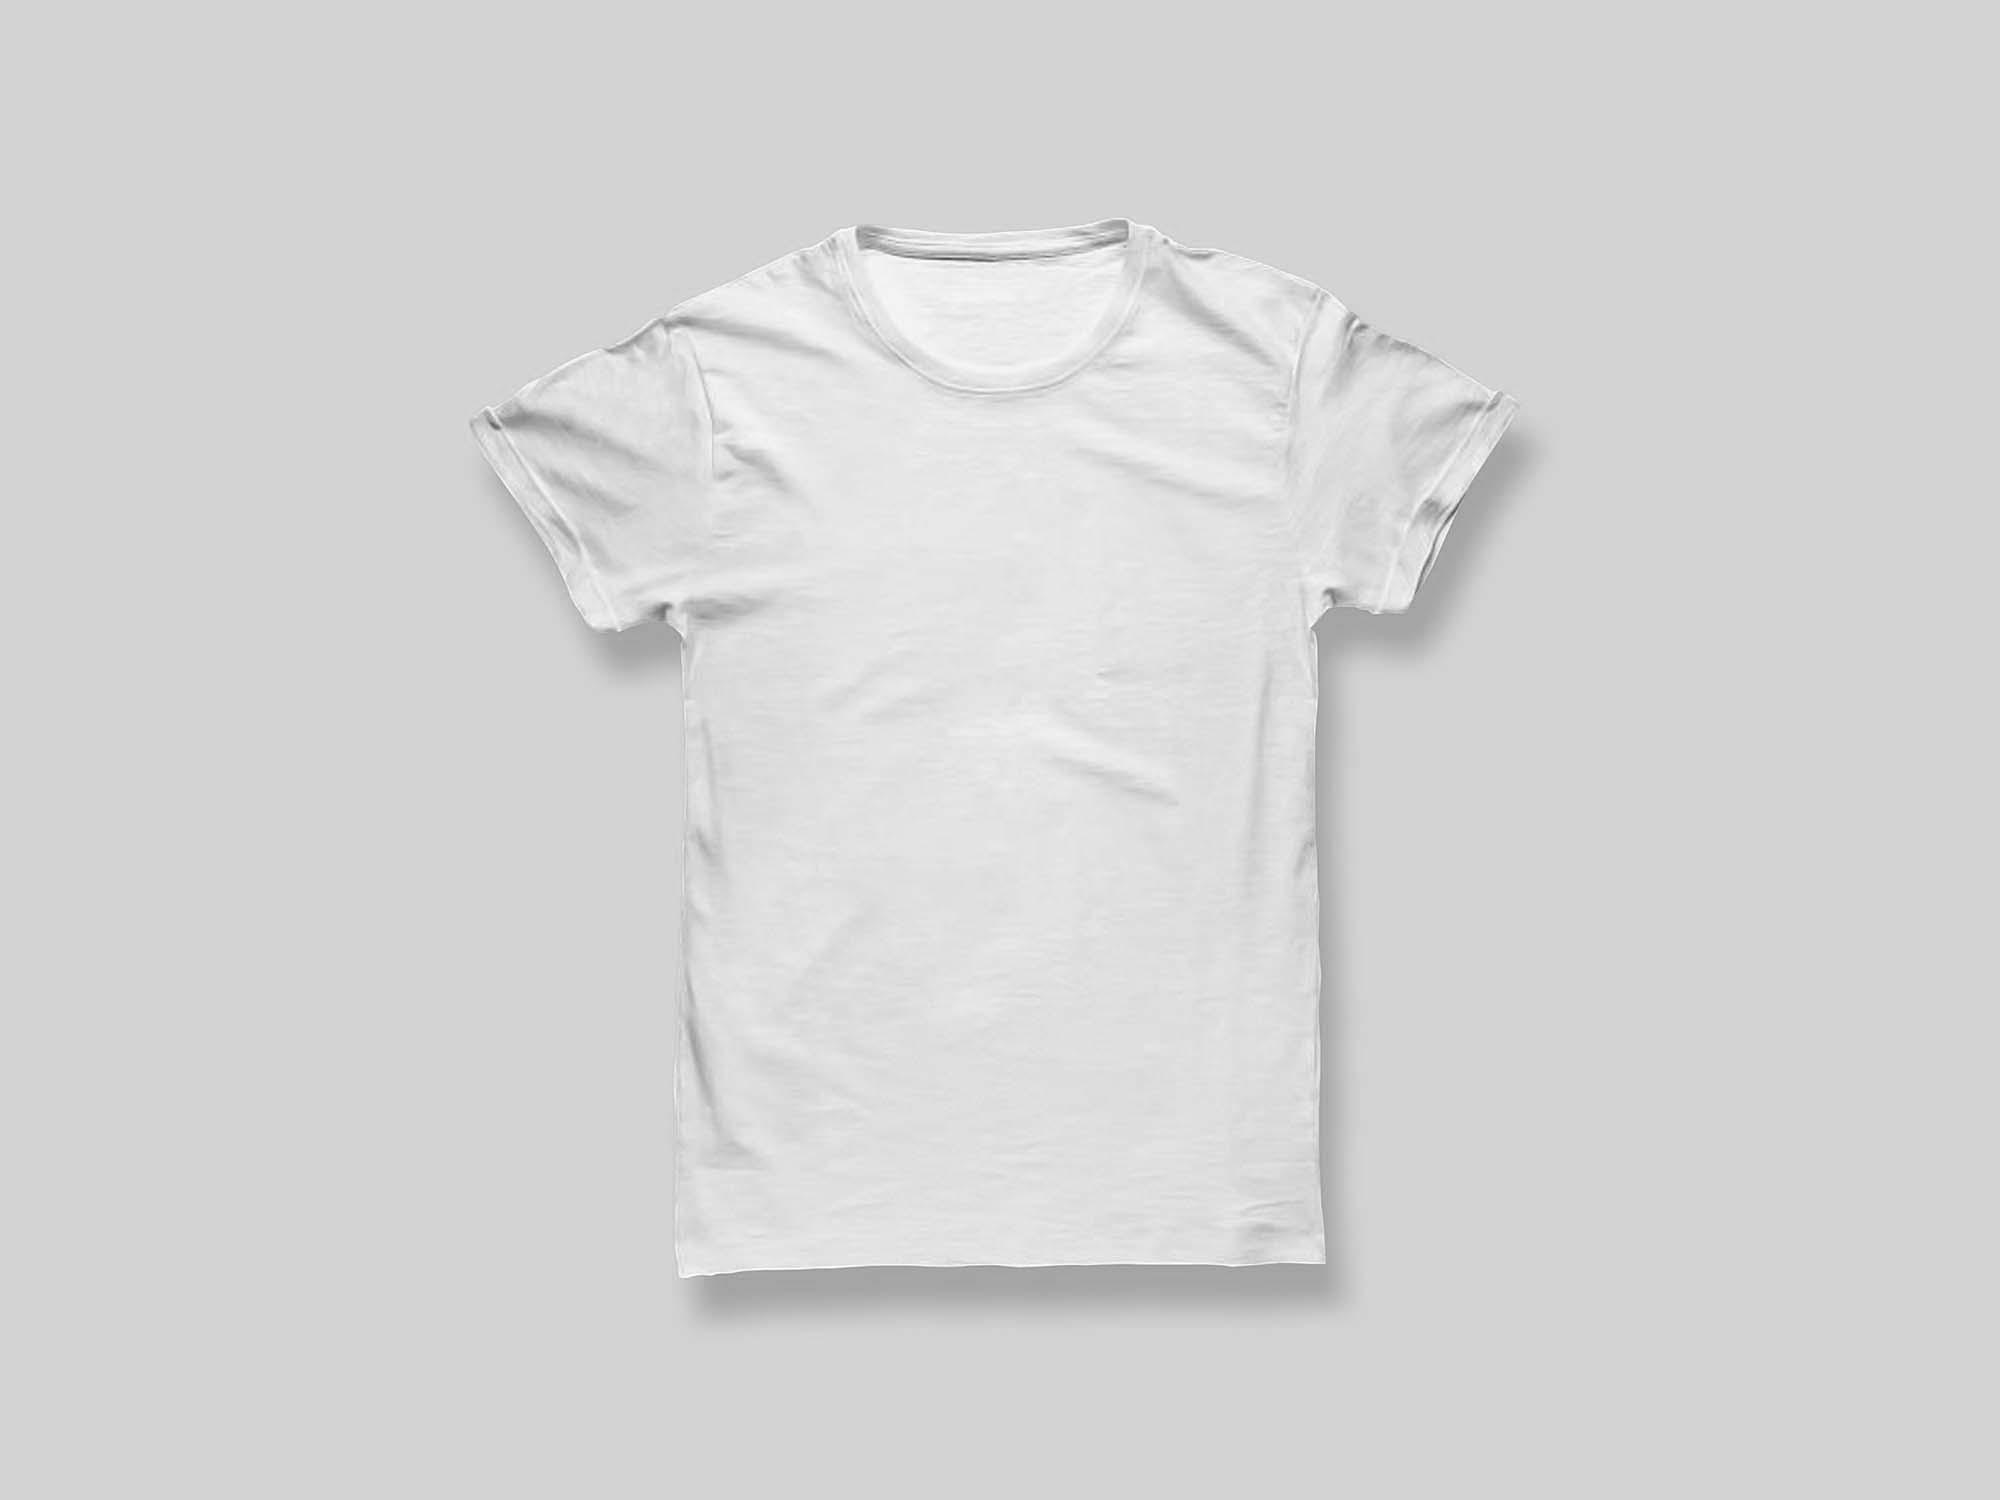 T-shirt Mockup For Men 3